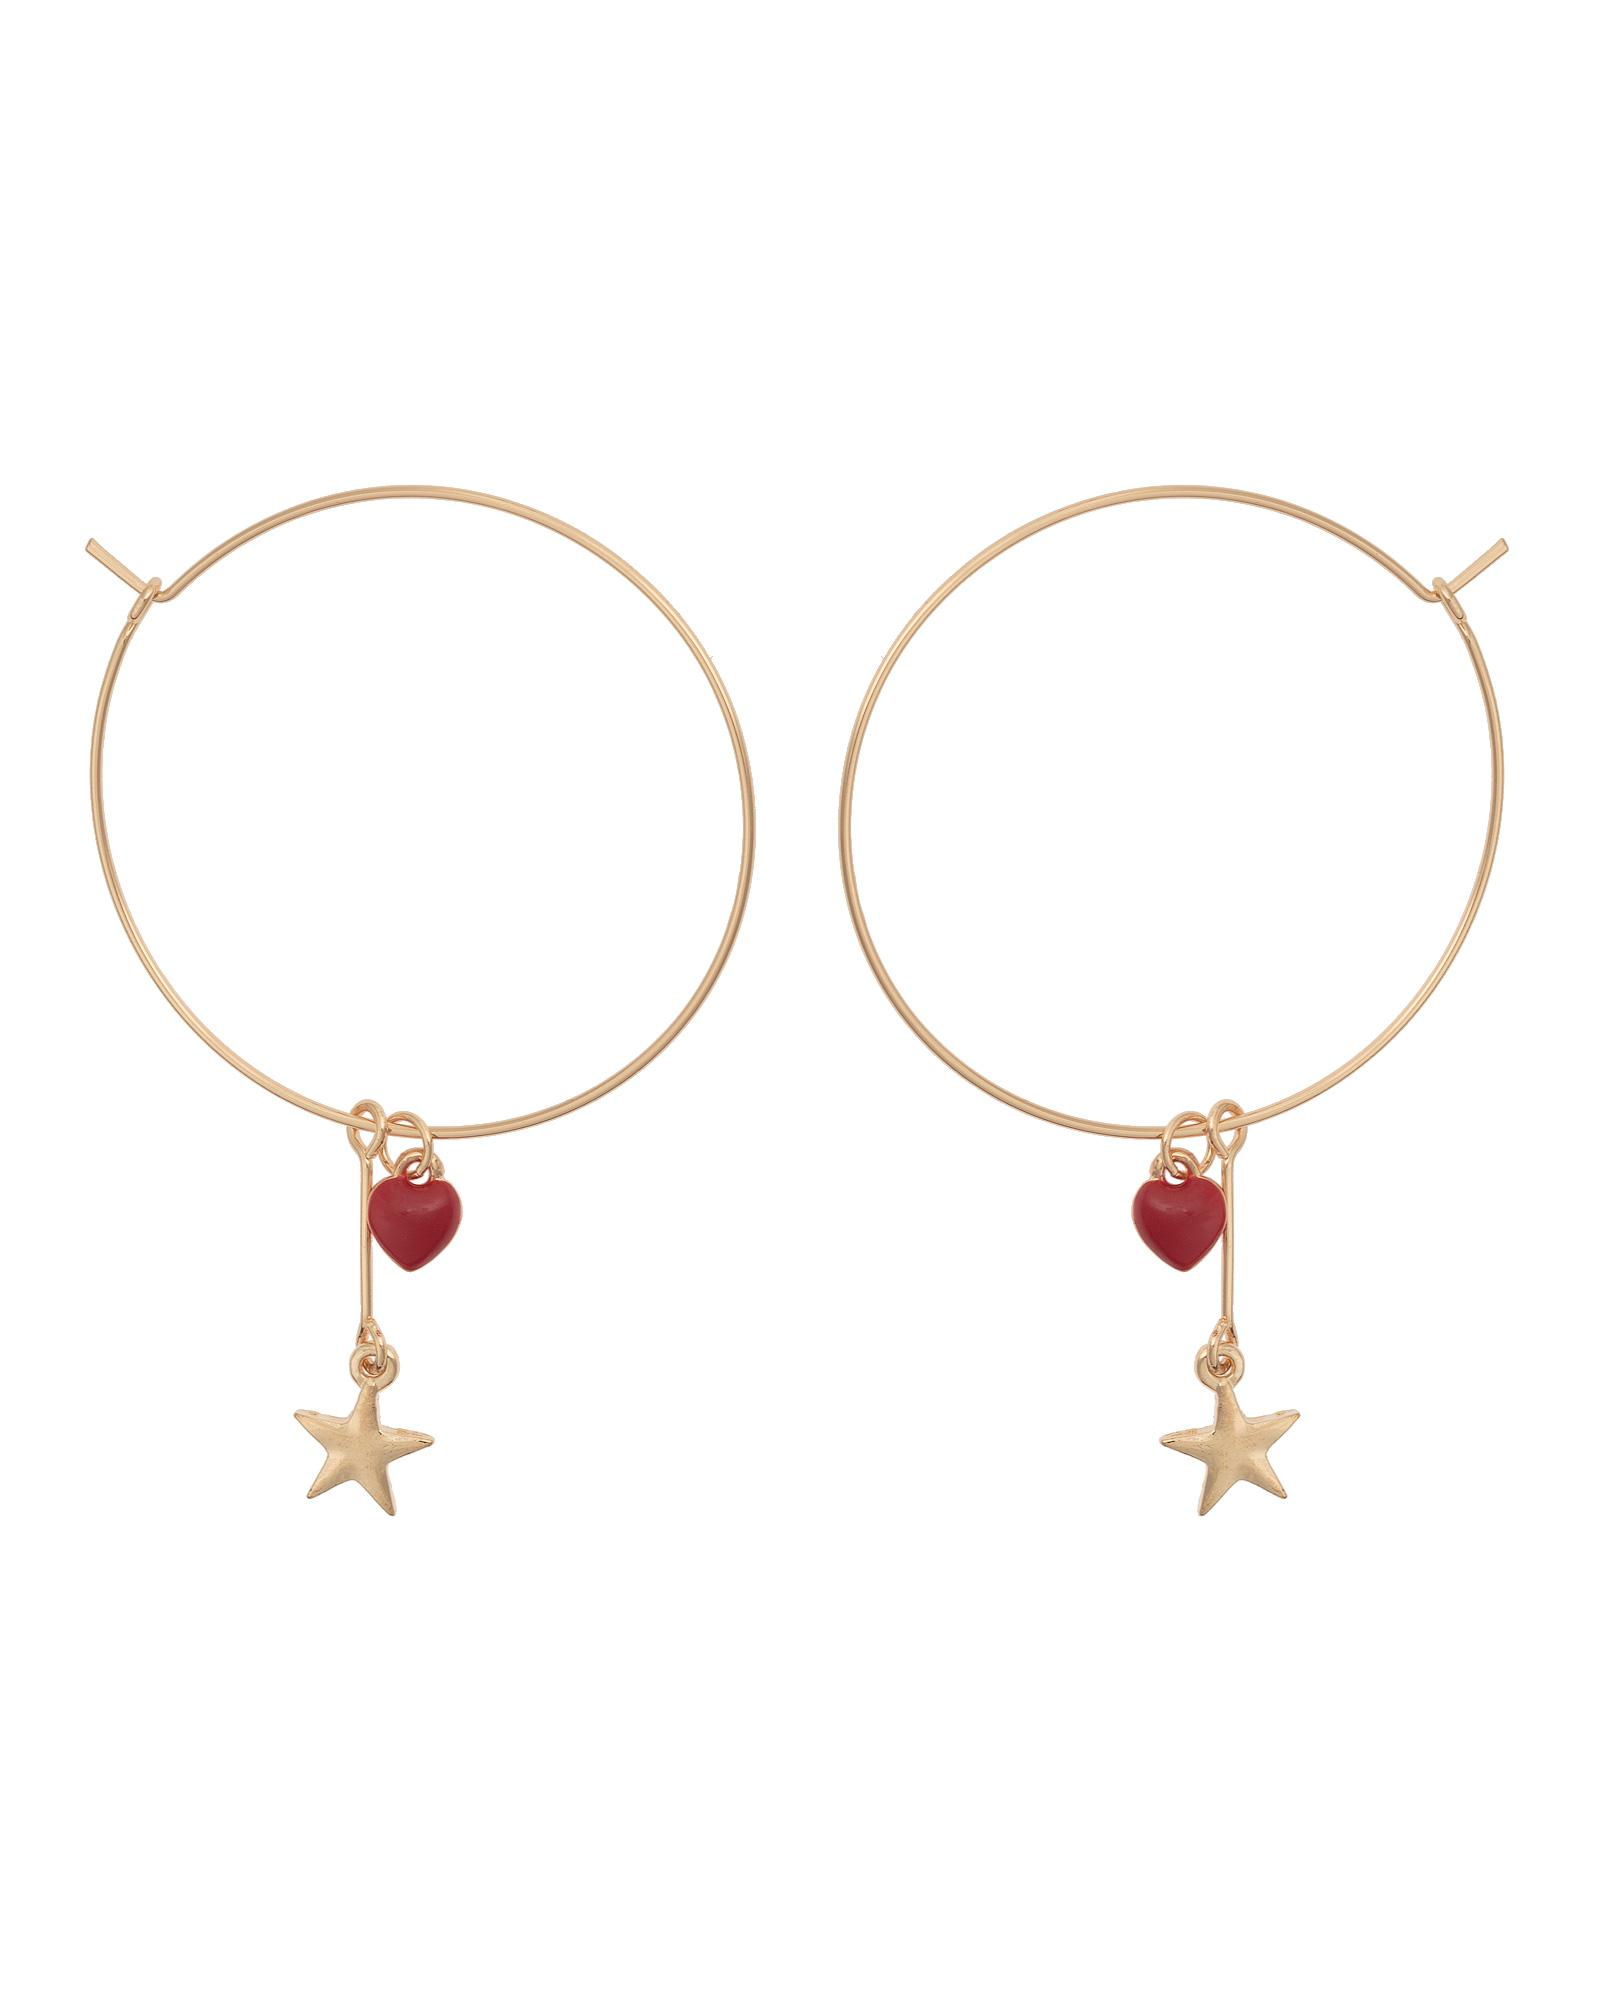 4f643cdb3 Oliver Bonas Hermia Heart & Star Charm Hoop Earrings in Metallic - Lyst